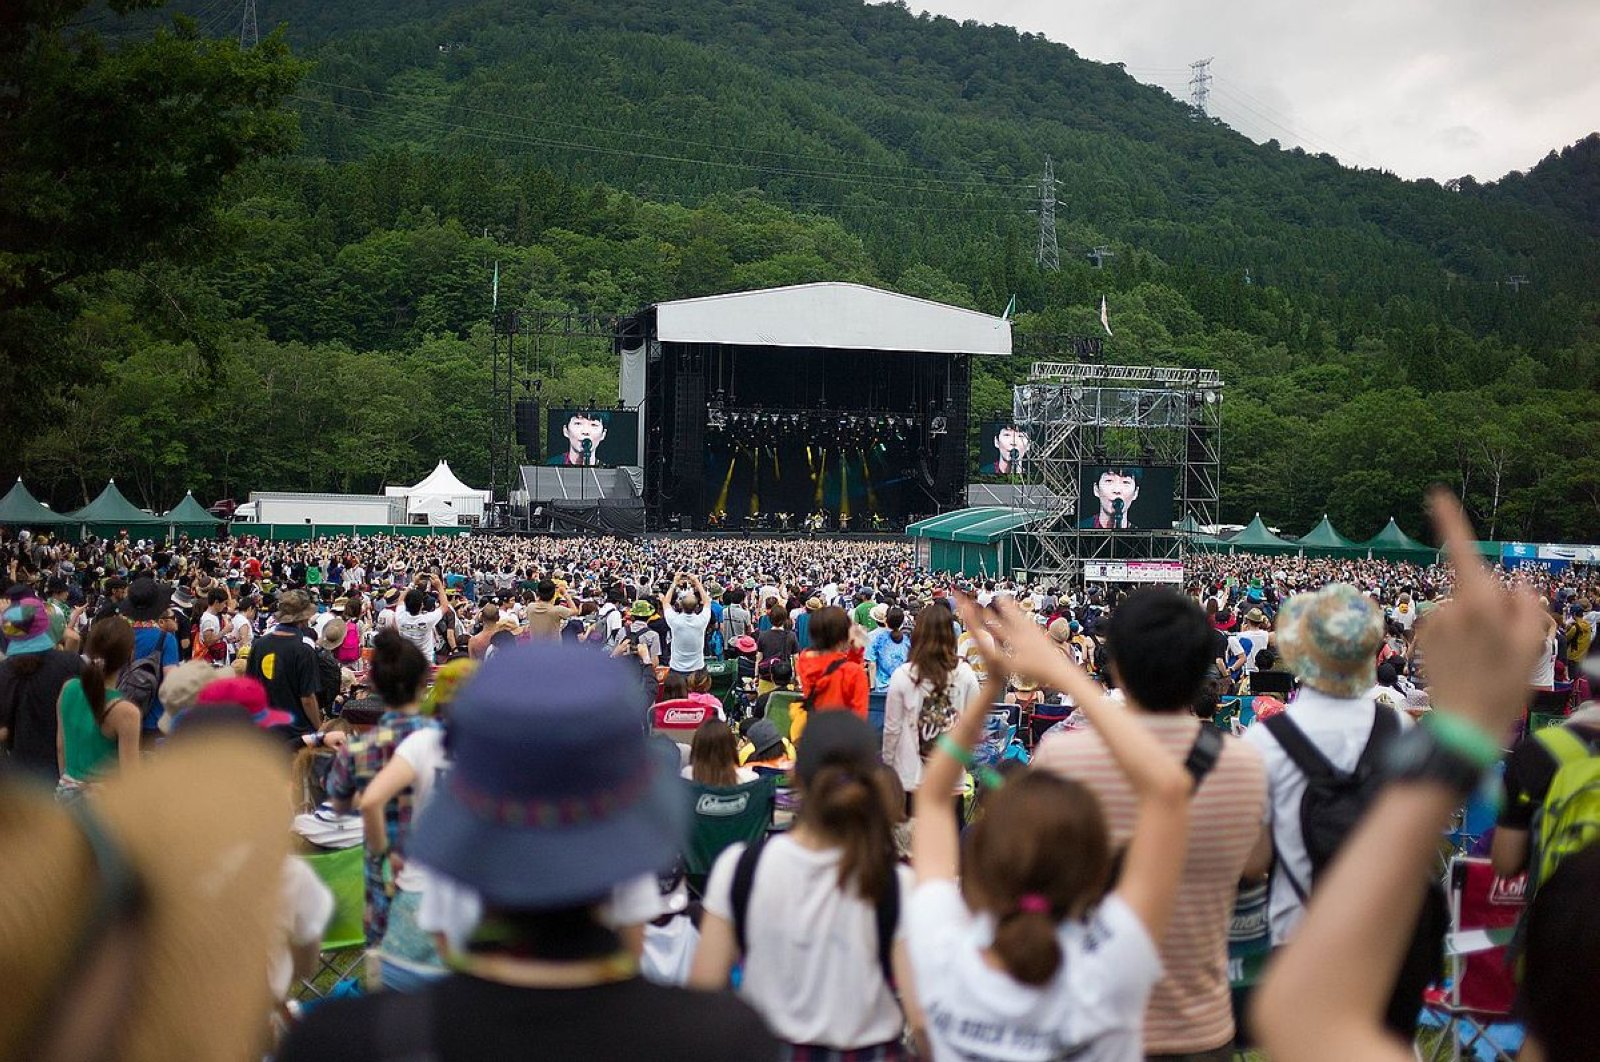 Gen Hoshino at the Fuji Rock Festival 2015.